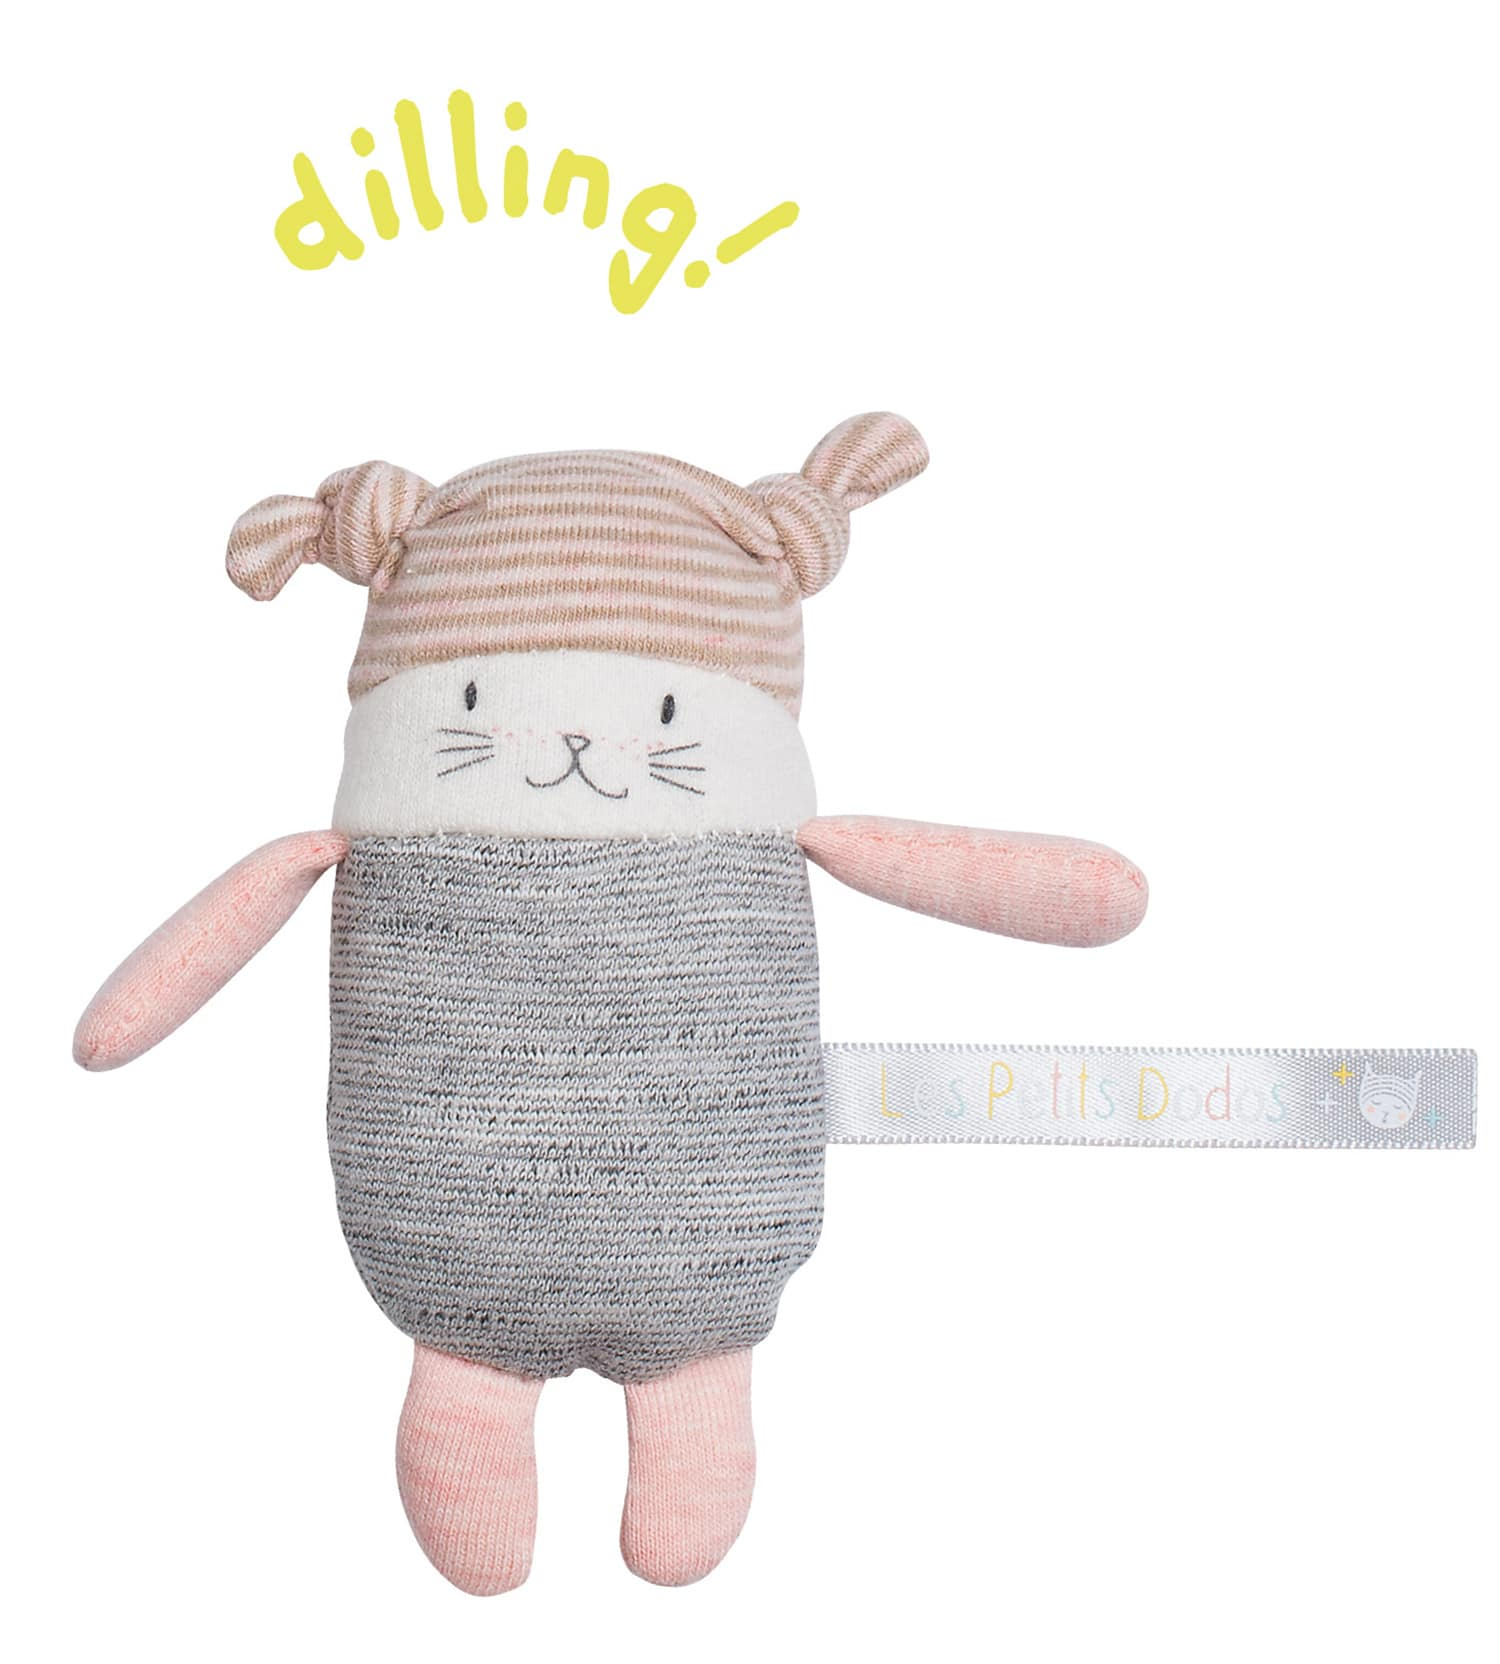 Les petits dodos - moon rattle - Moulin Roty toys Australia